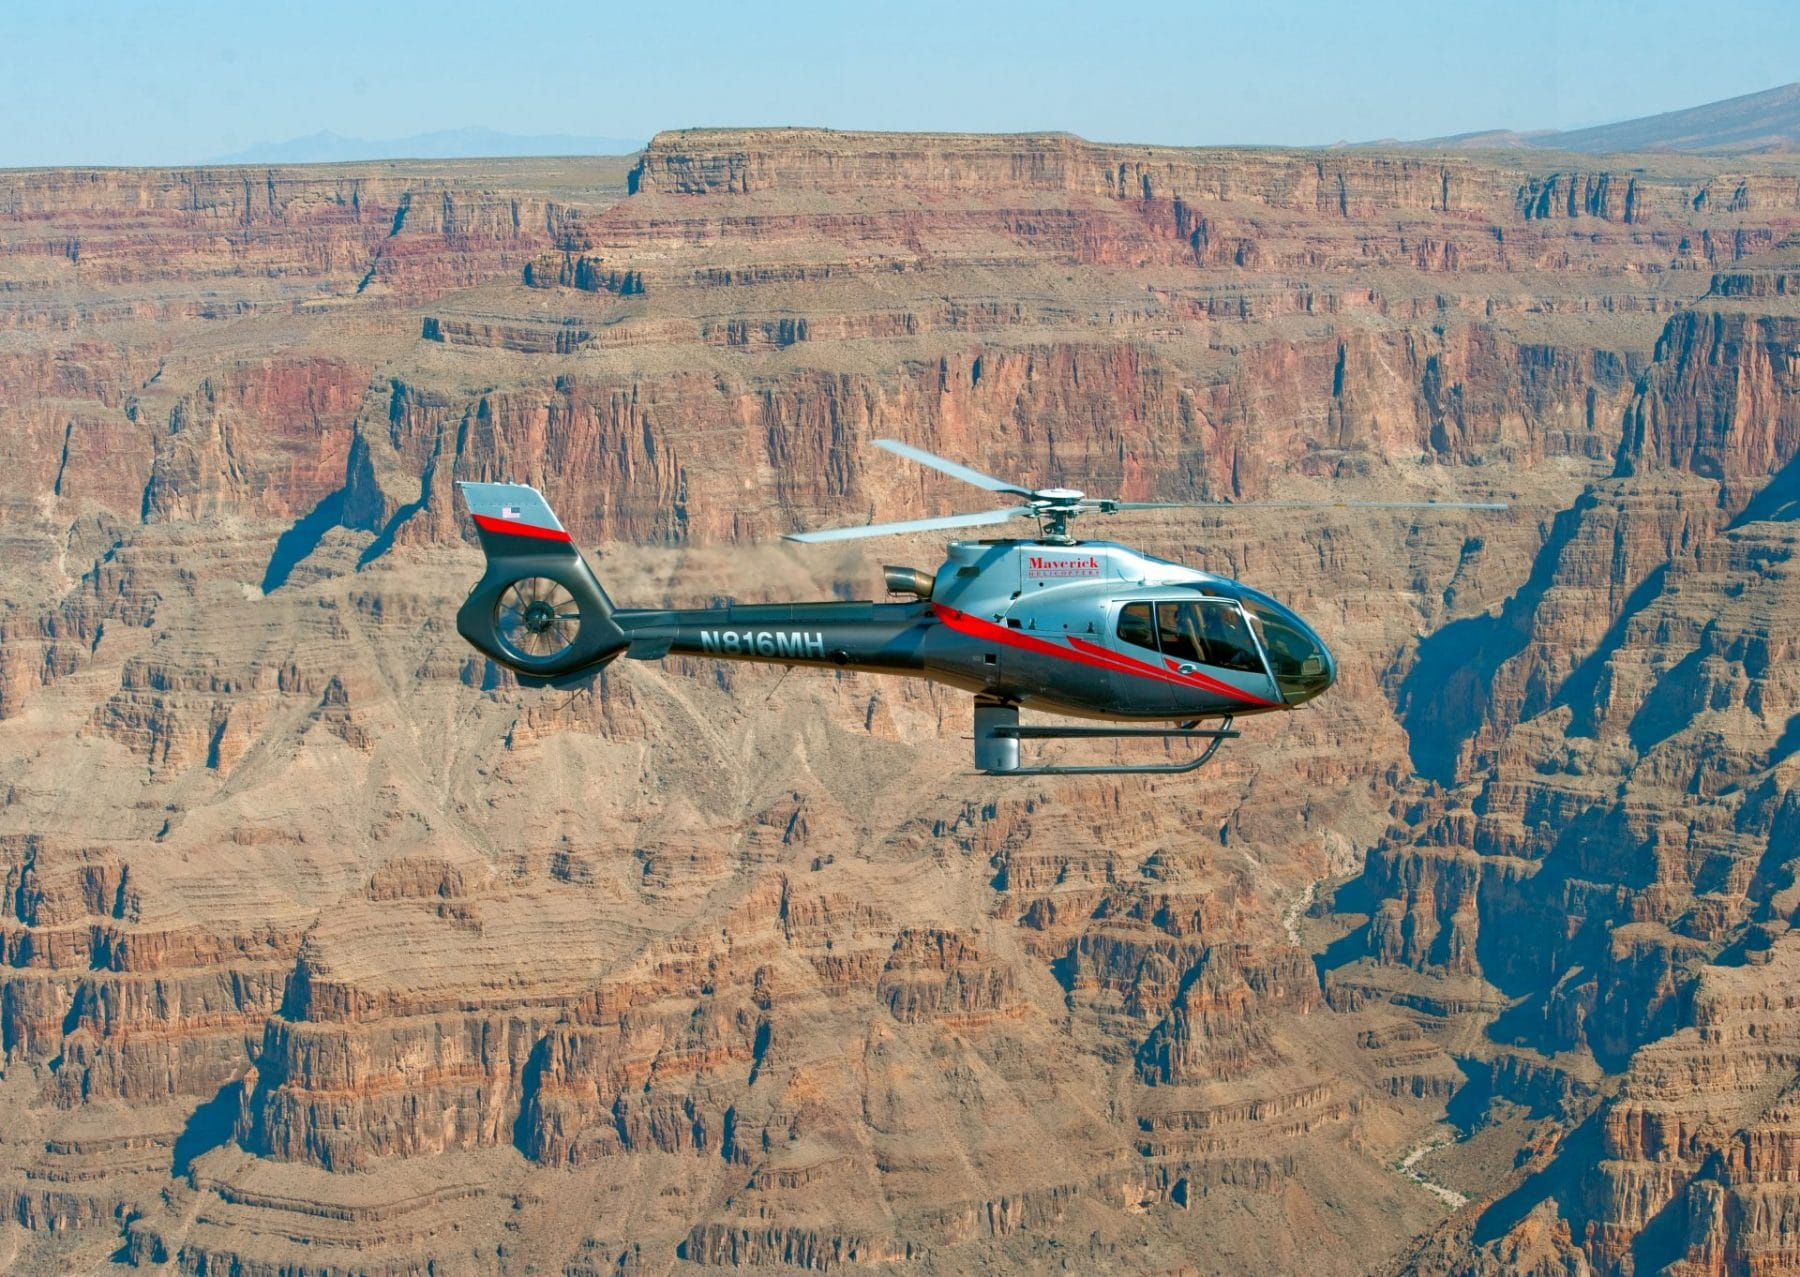 Maverick Aviation Group